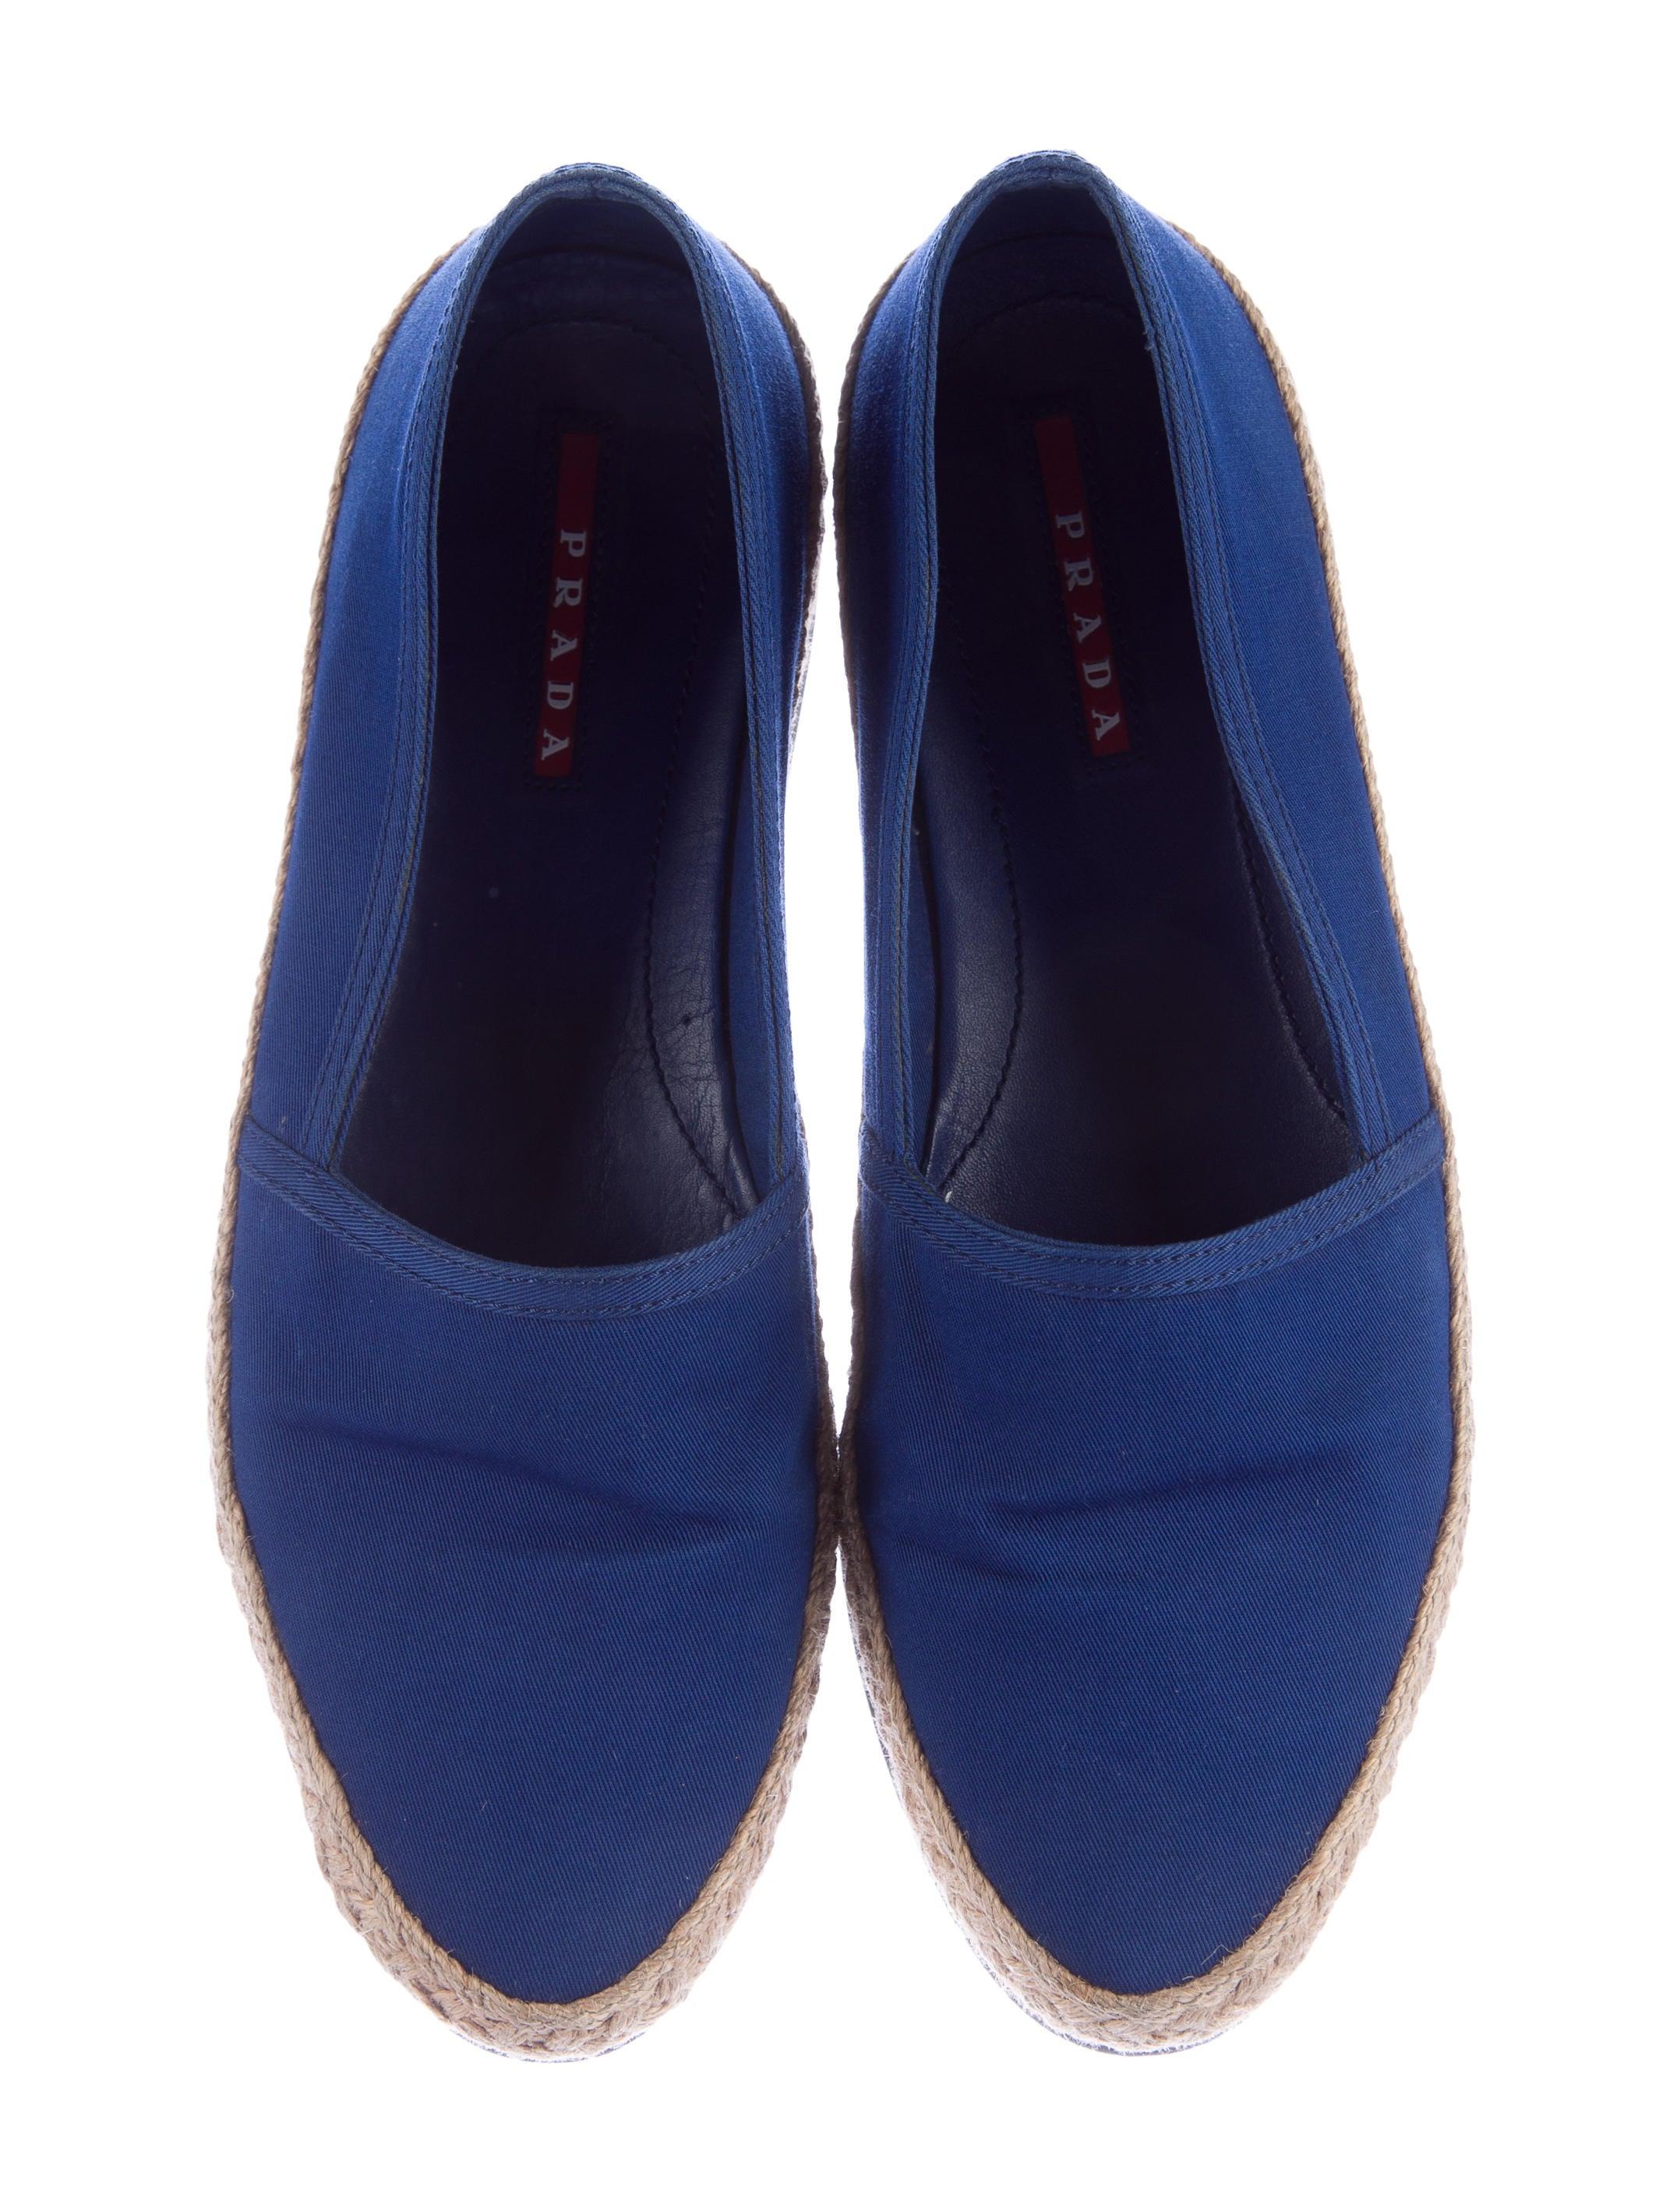 prada canvas espadrille flats shoes pra110516 the